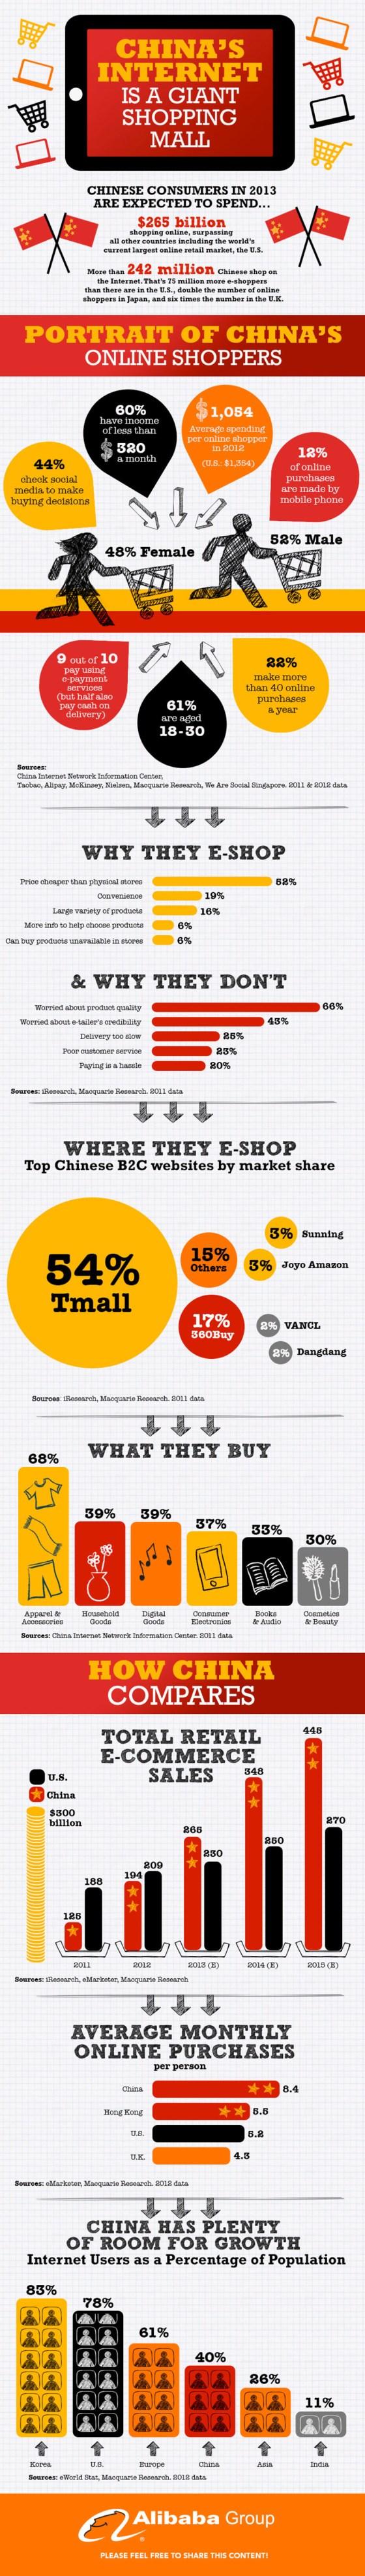 infographic-alibaba-ecommerce